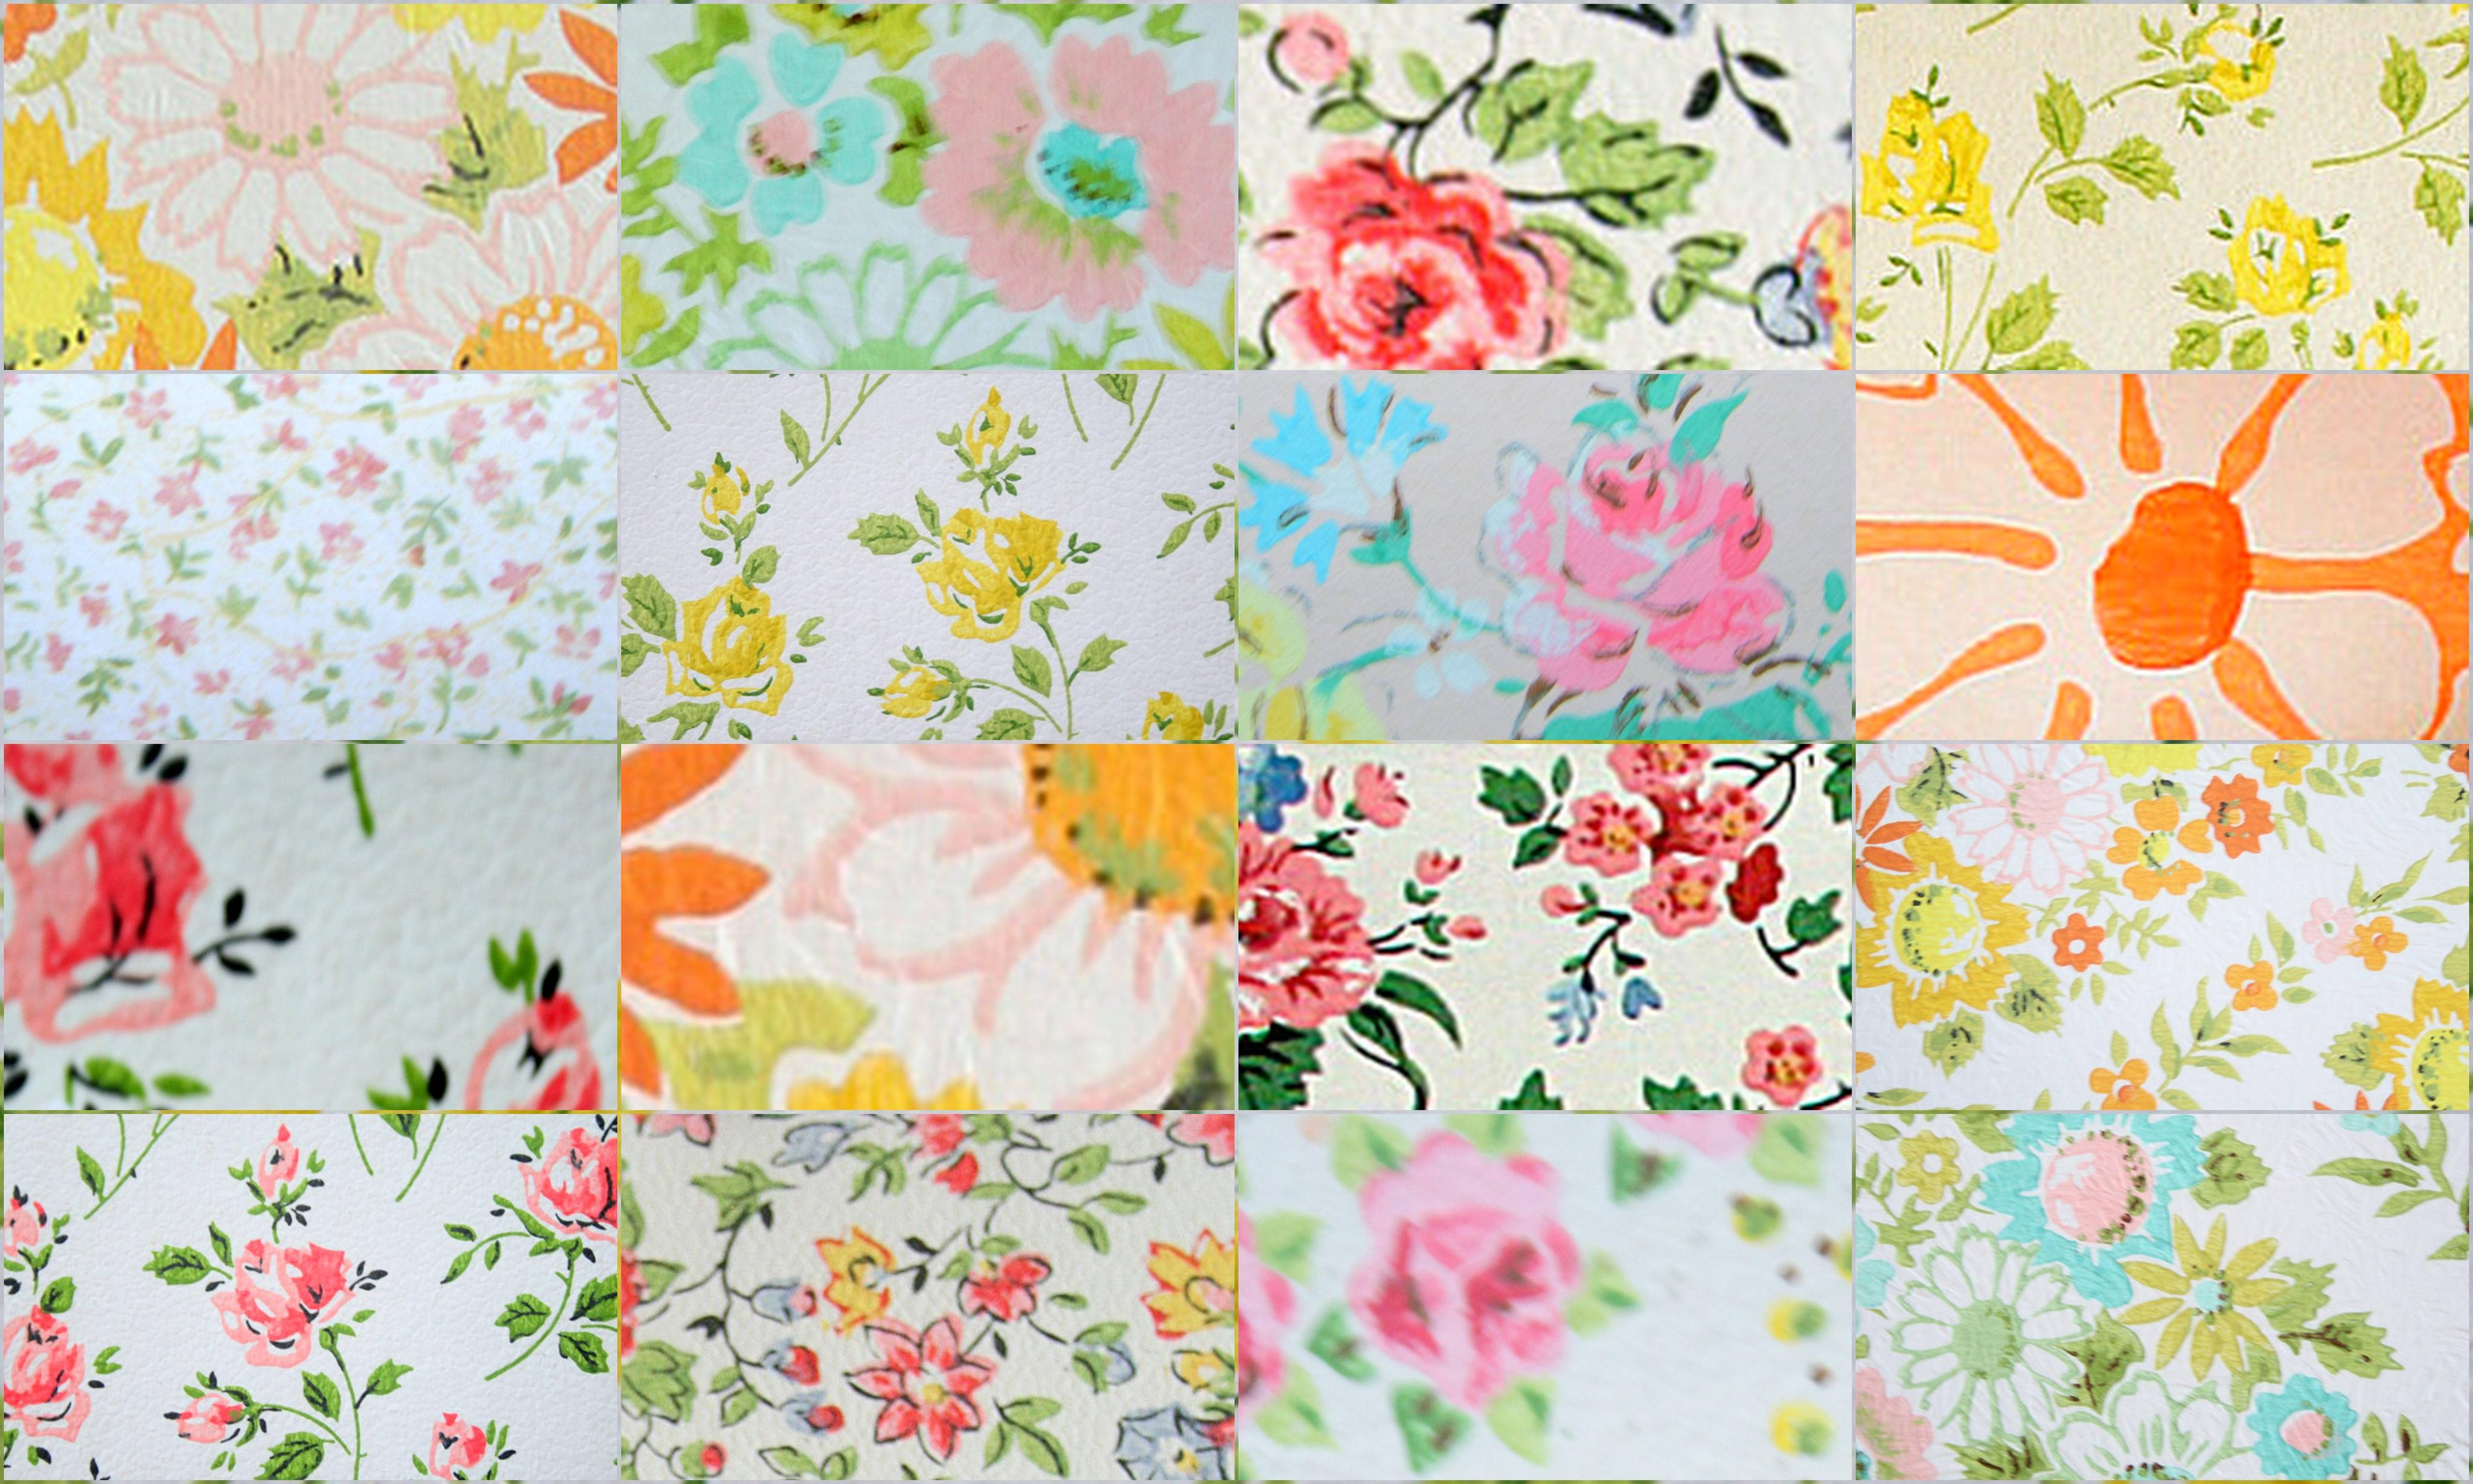 Hipster Flower Backgrounds Tumblr Wallpaper Cave